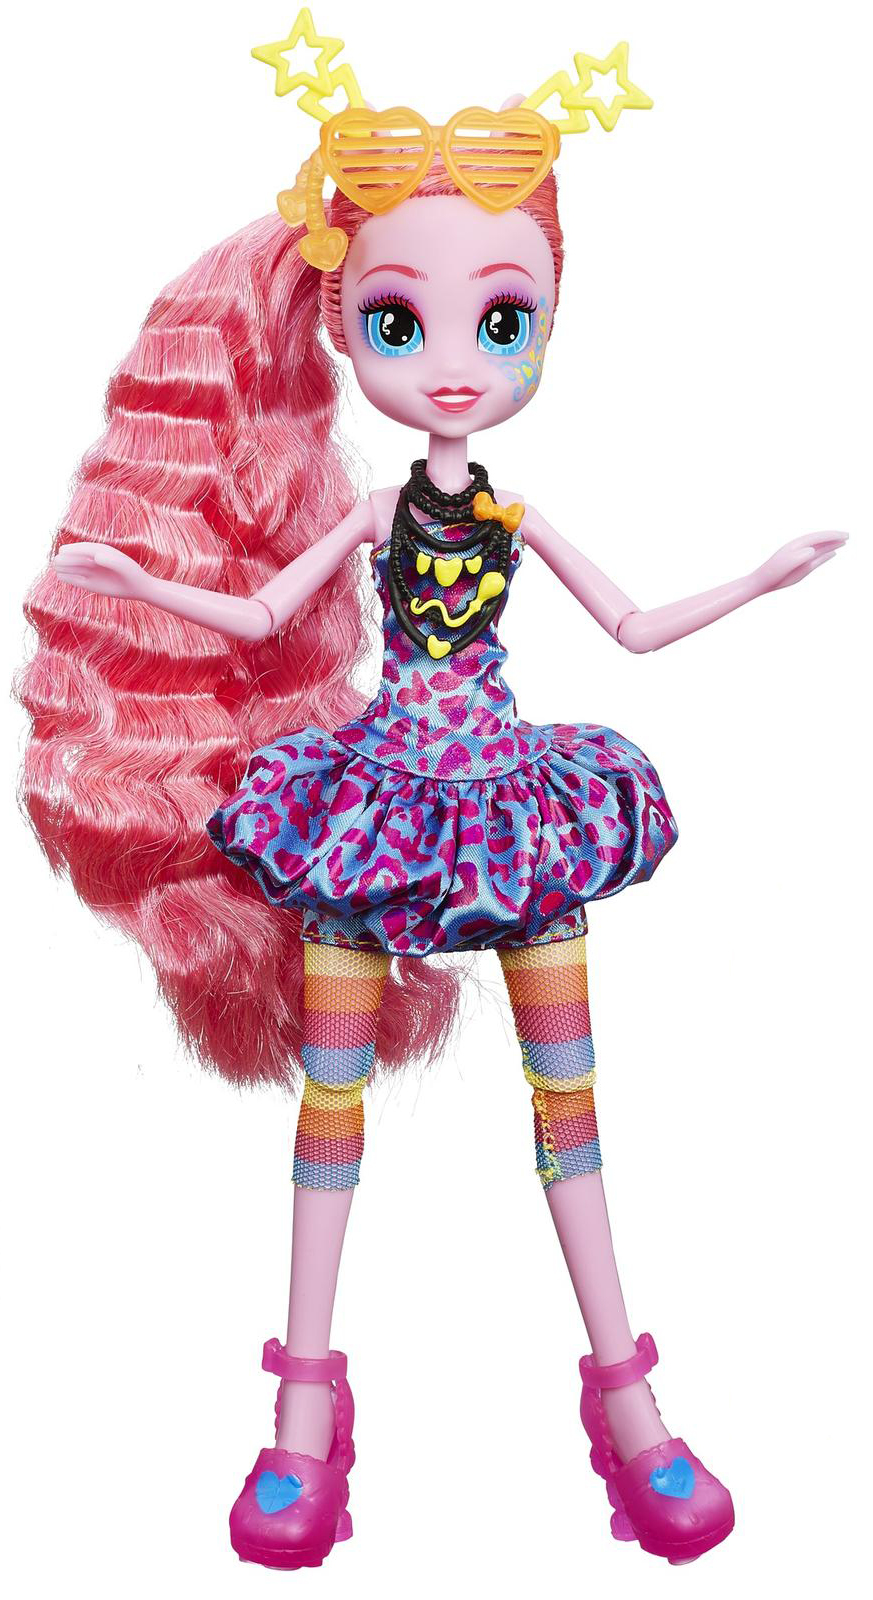 G4 My Little Pony Equestria Girls Dolls Friendship Is